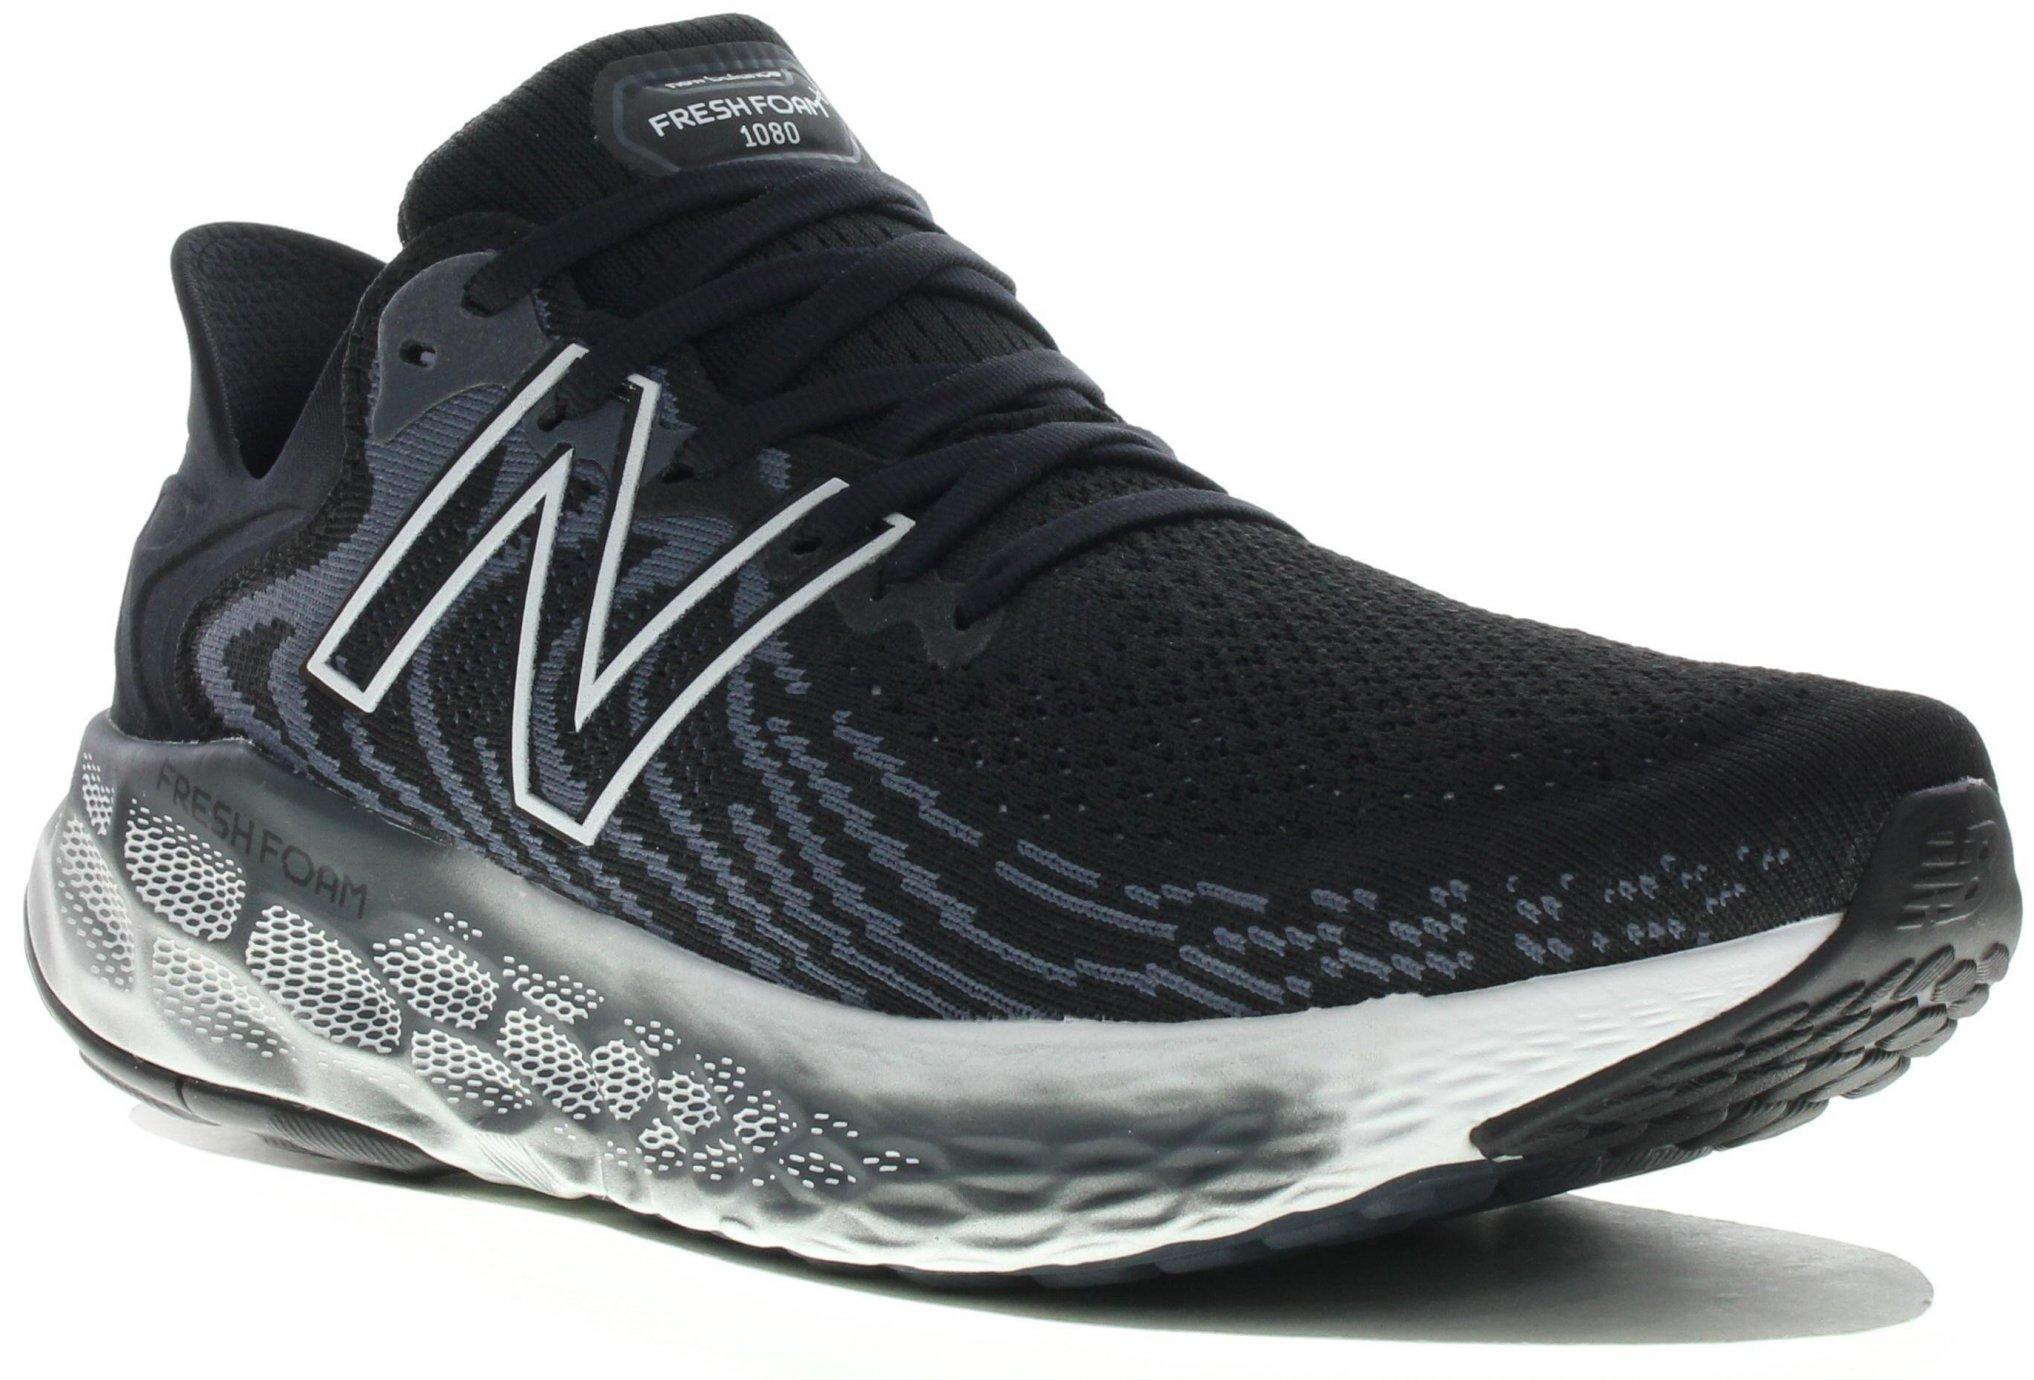 New Balance Fresh Foam M 1080 V11 - D Chaussures homme